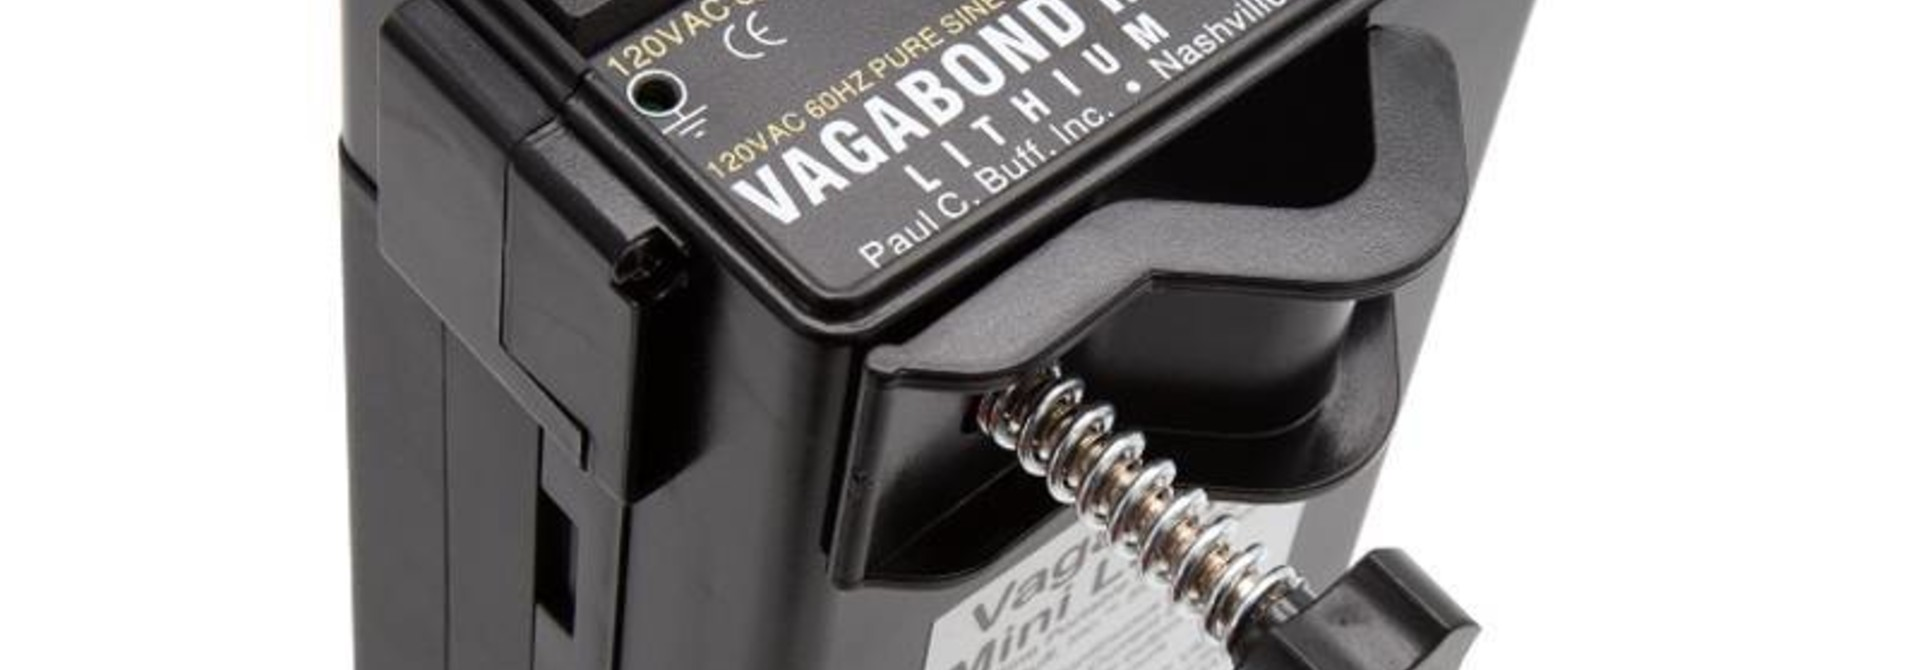 Vagabond Portable Power